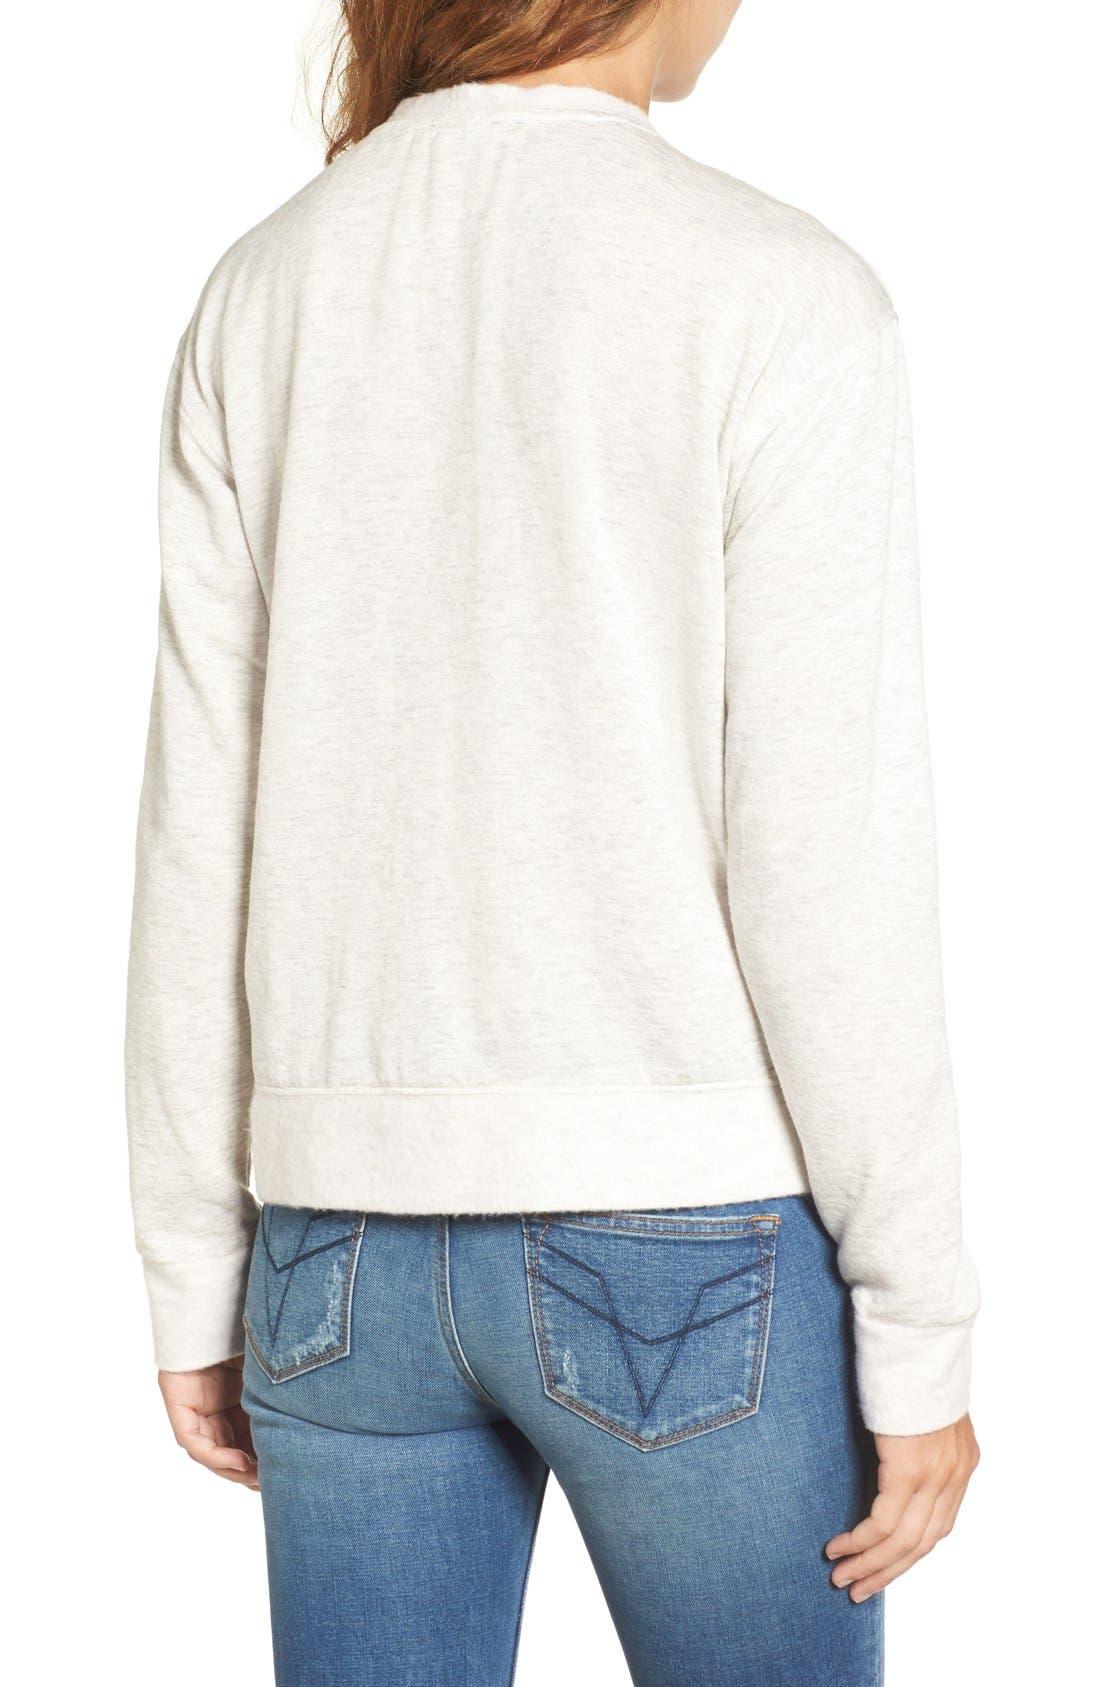 Alternate Image 3  - Socialite Lace-Up Sweatshirt